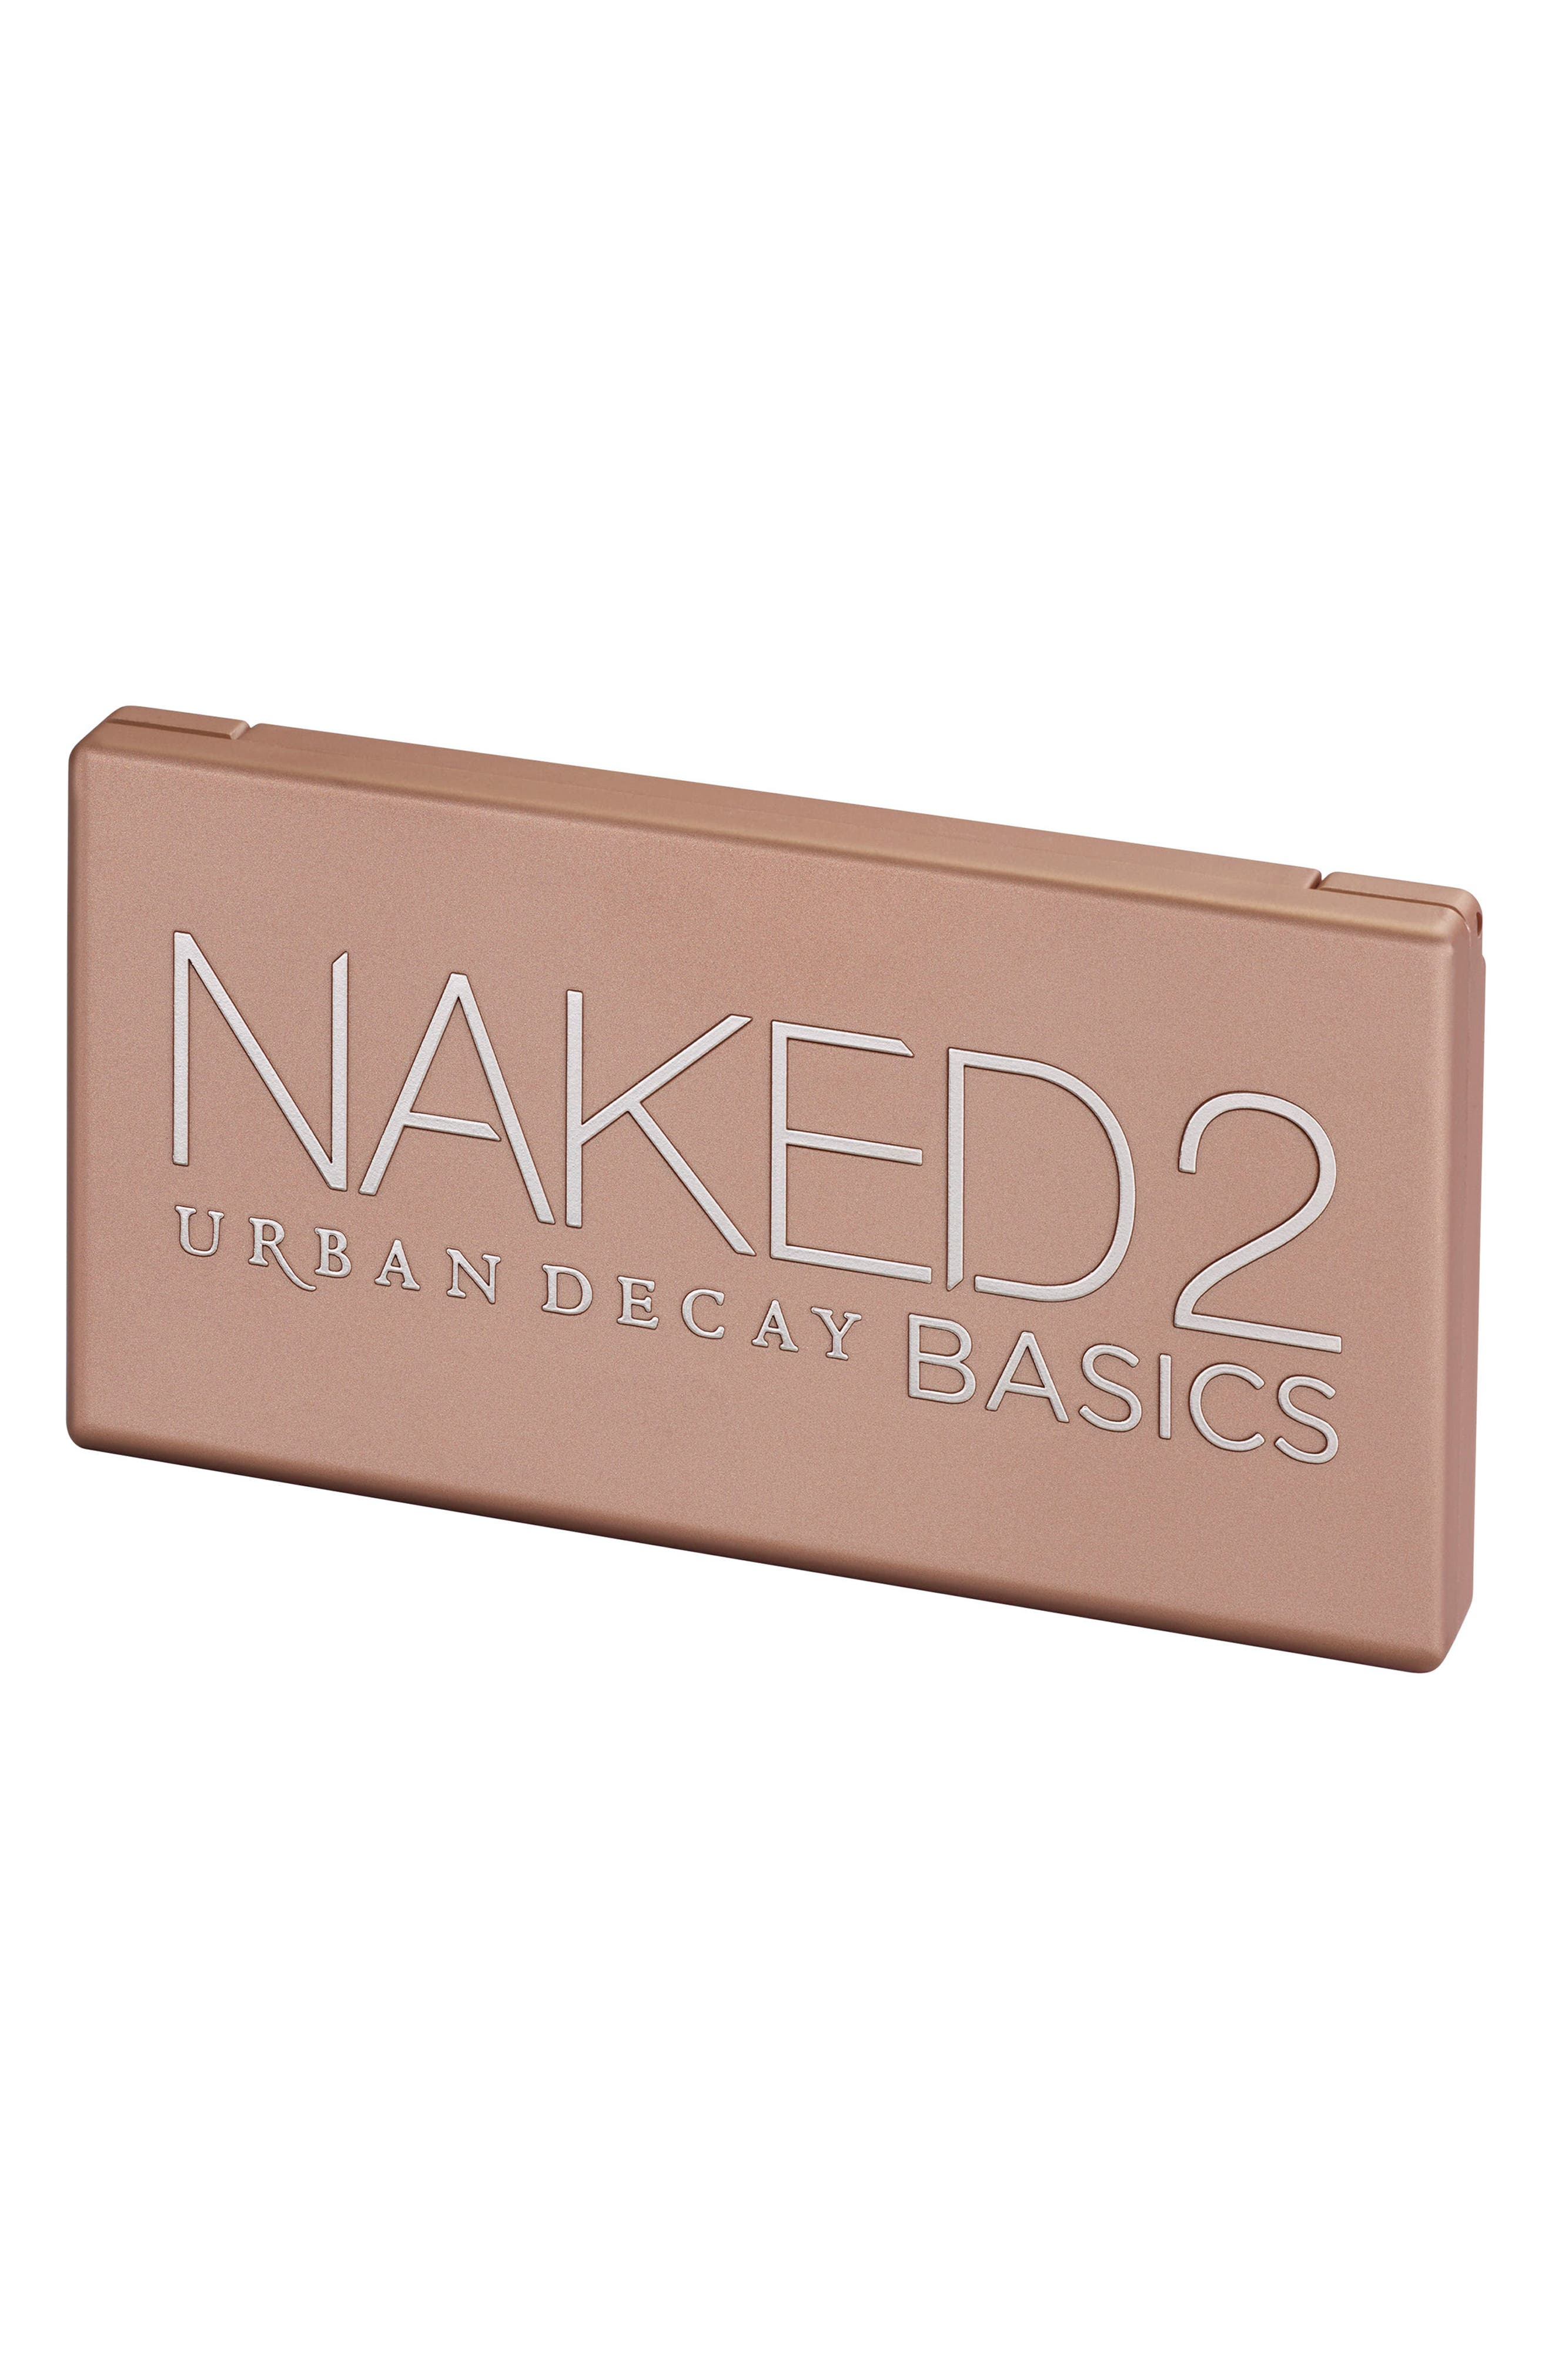 Naked2 Basics Set,                             Alternate thumbnail 4, color,                             NO COLOR